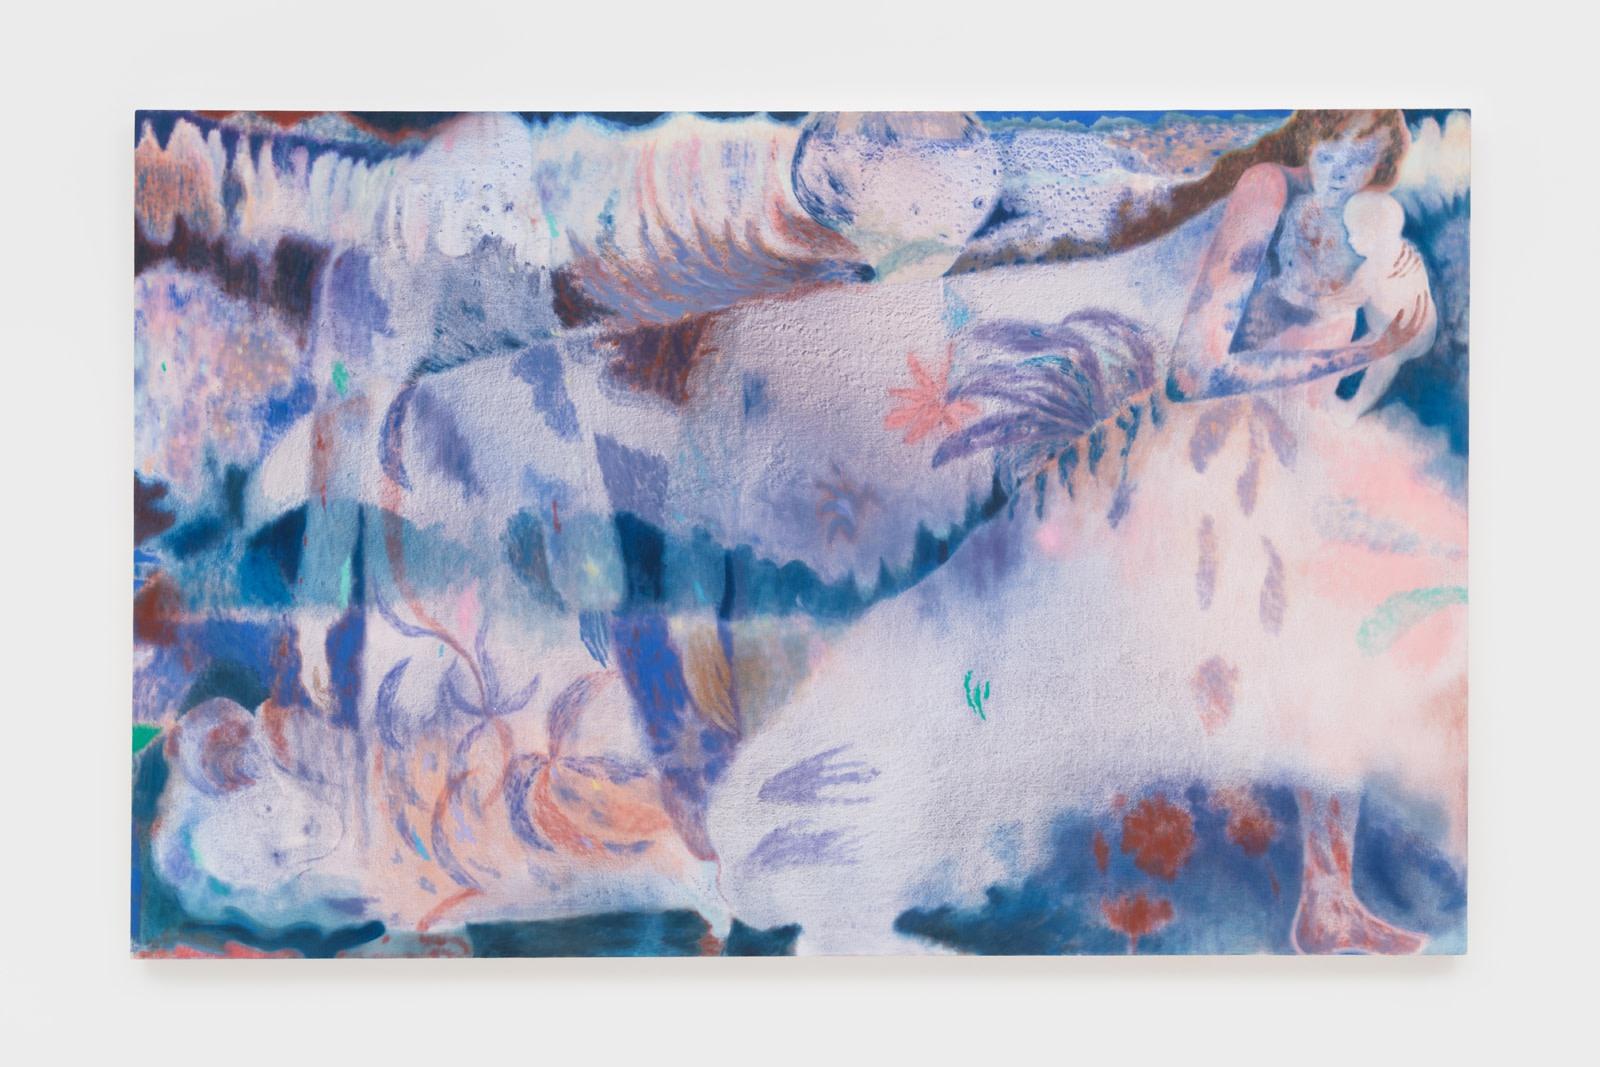 Maja Ruznic Odlazak, 2020 Acrylic and oil on canvas 193 x 304.8 cm 76 x 120 in Inquire